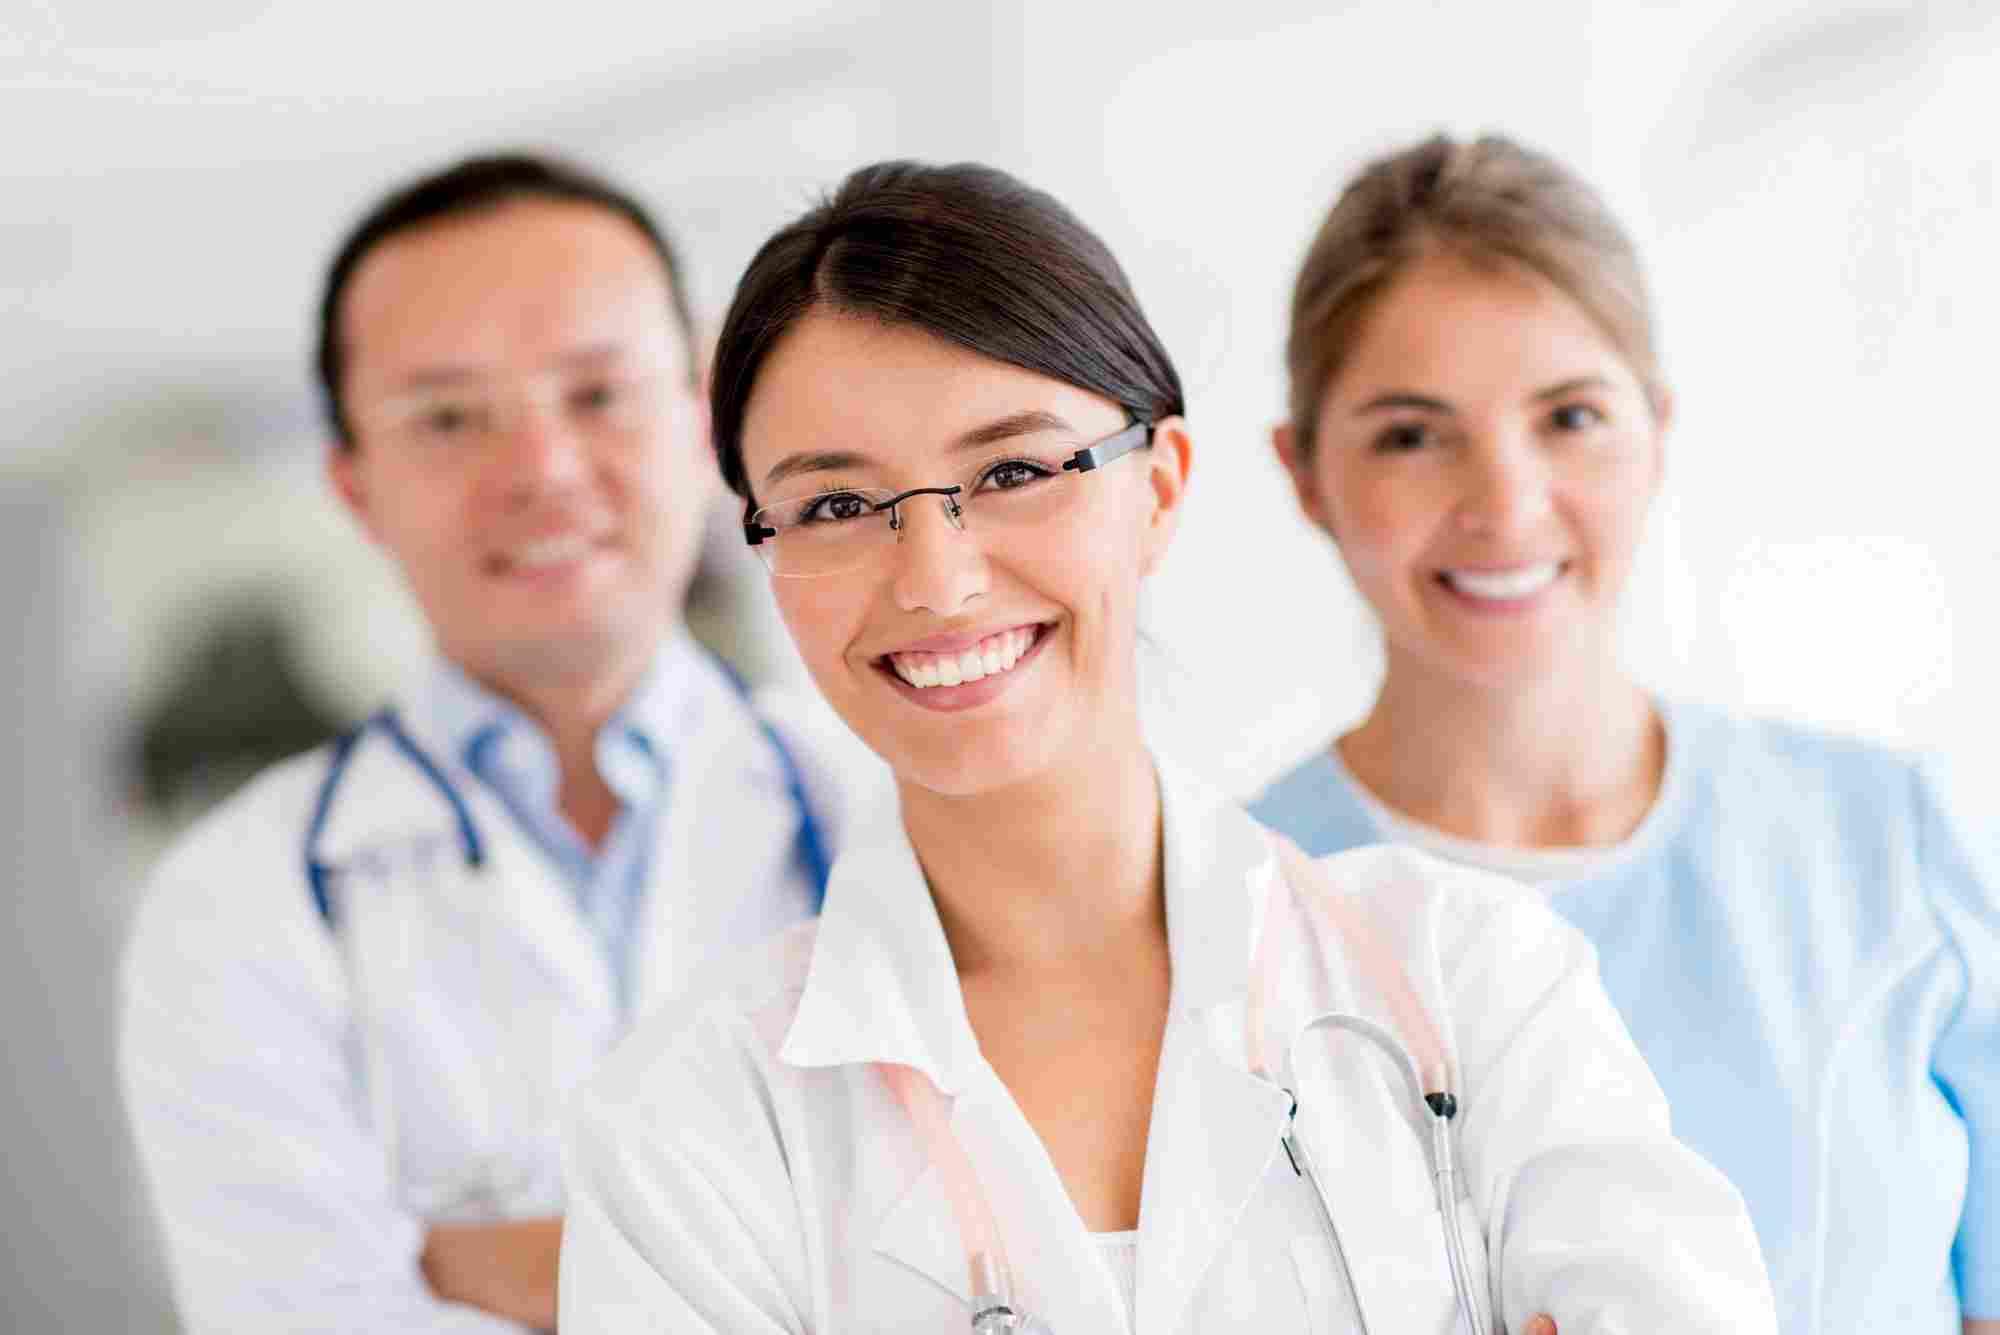 http://cirurgiadeobesidade.med.br/wp-content/uploads/2015/12/doctors.jpg